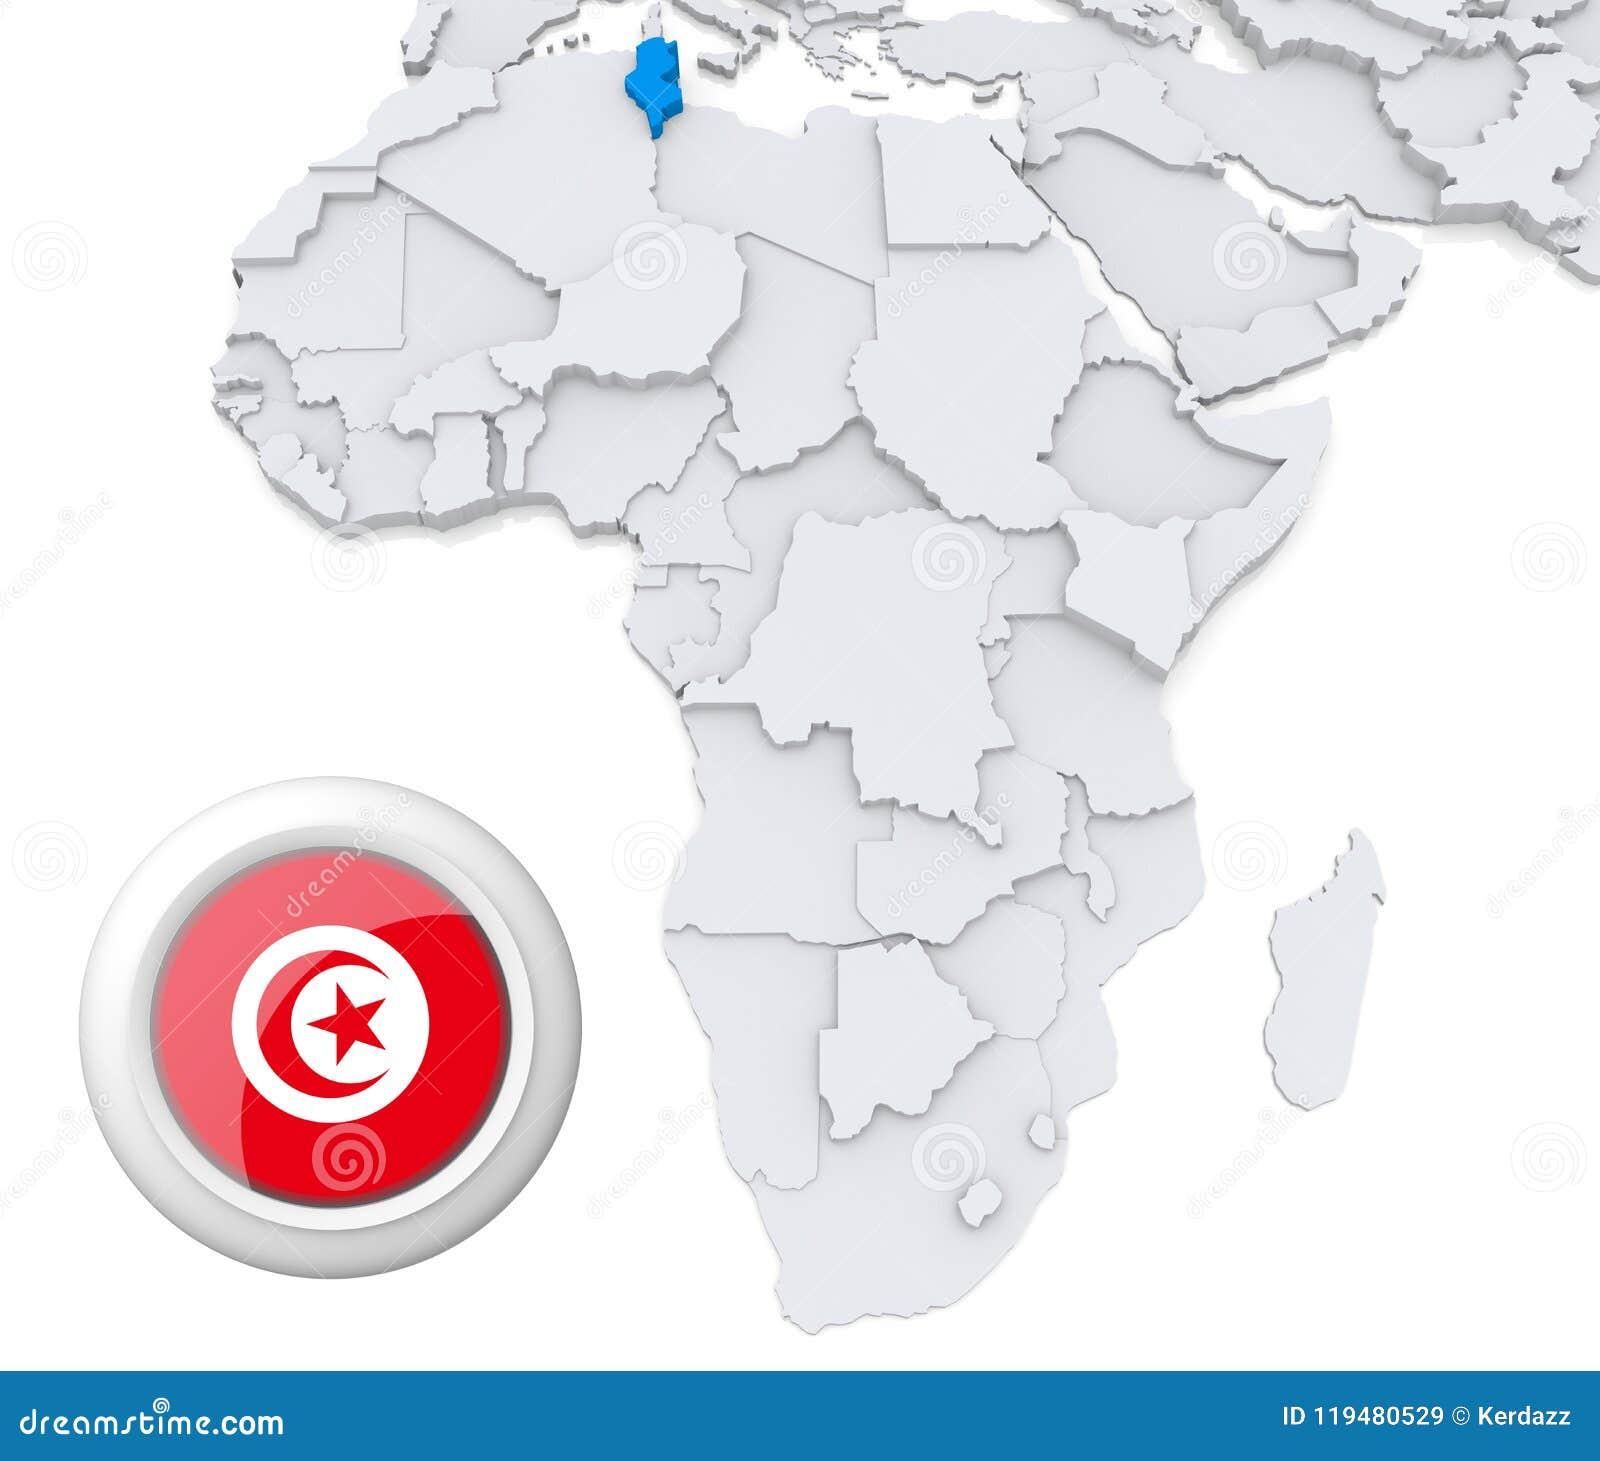 Tunisia on Africa map stock illustration. Illustration of graphic ...